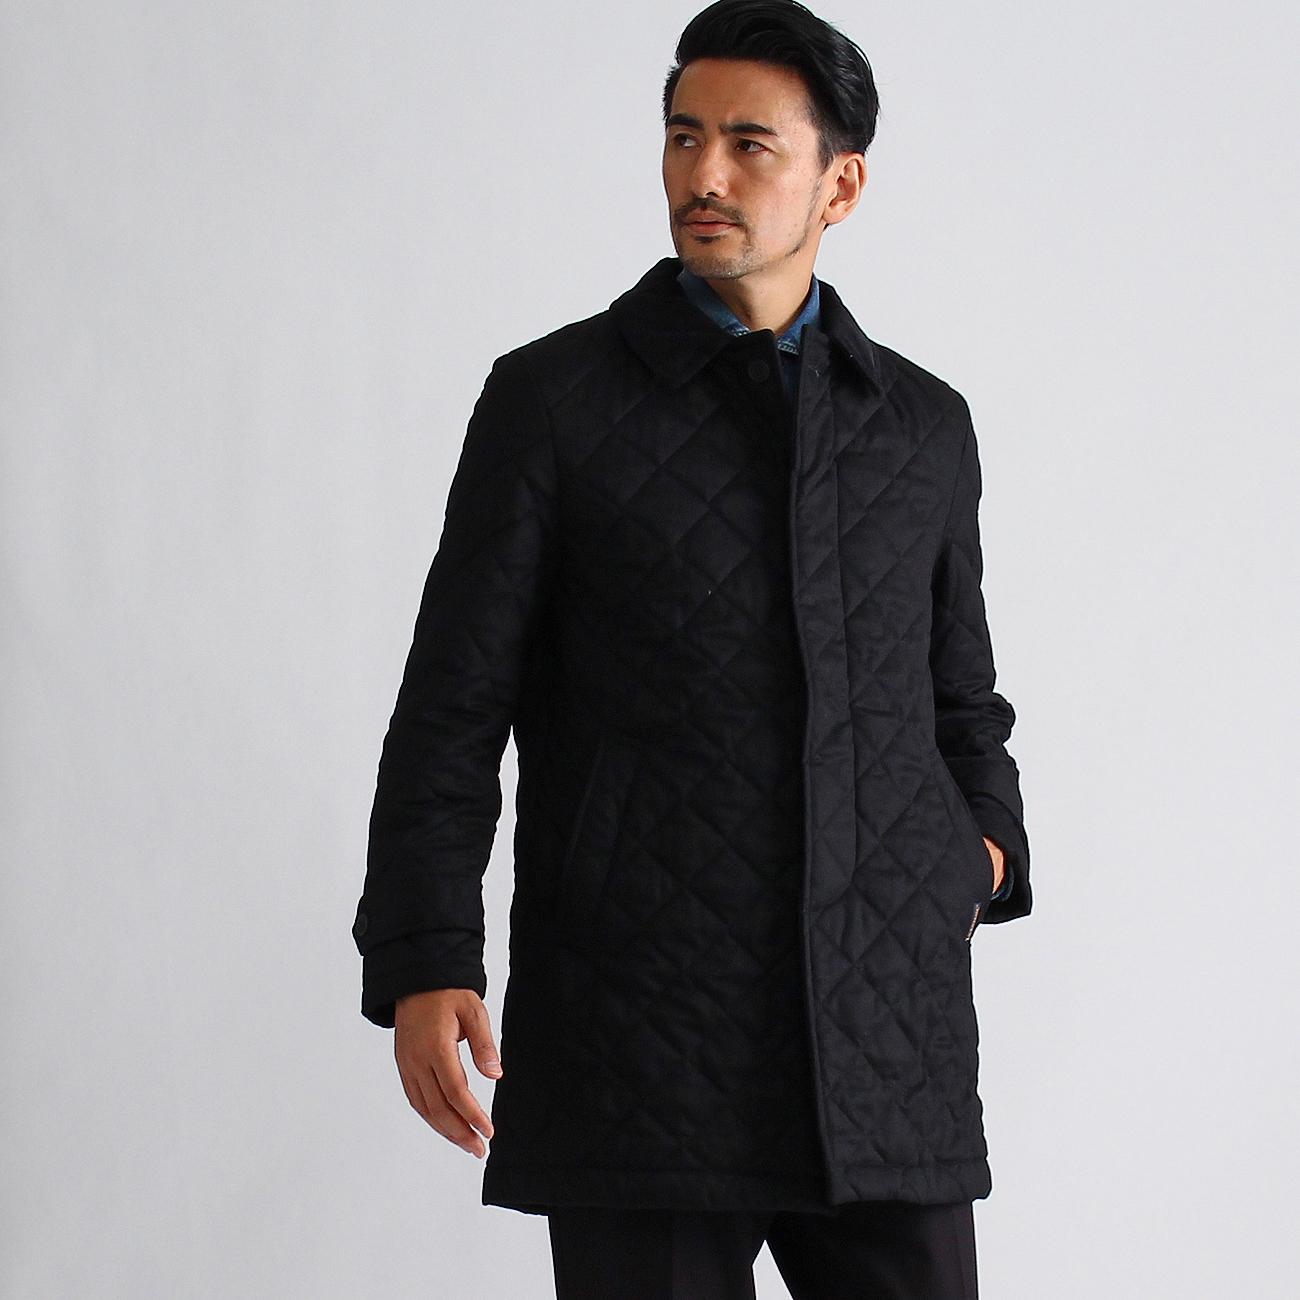 【TAKEO KIKUCHI (タケオキクチ)】LAVENHAM(EUSTON)ブルゾンメンズ ジャケット|その他ジャケット ブラック